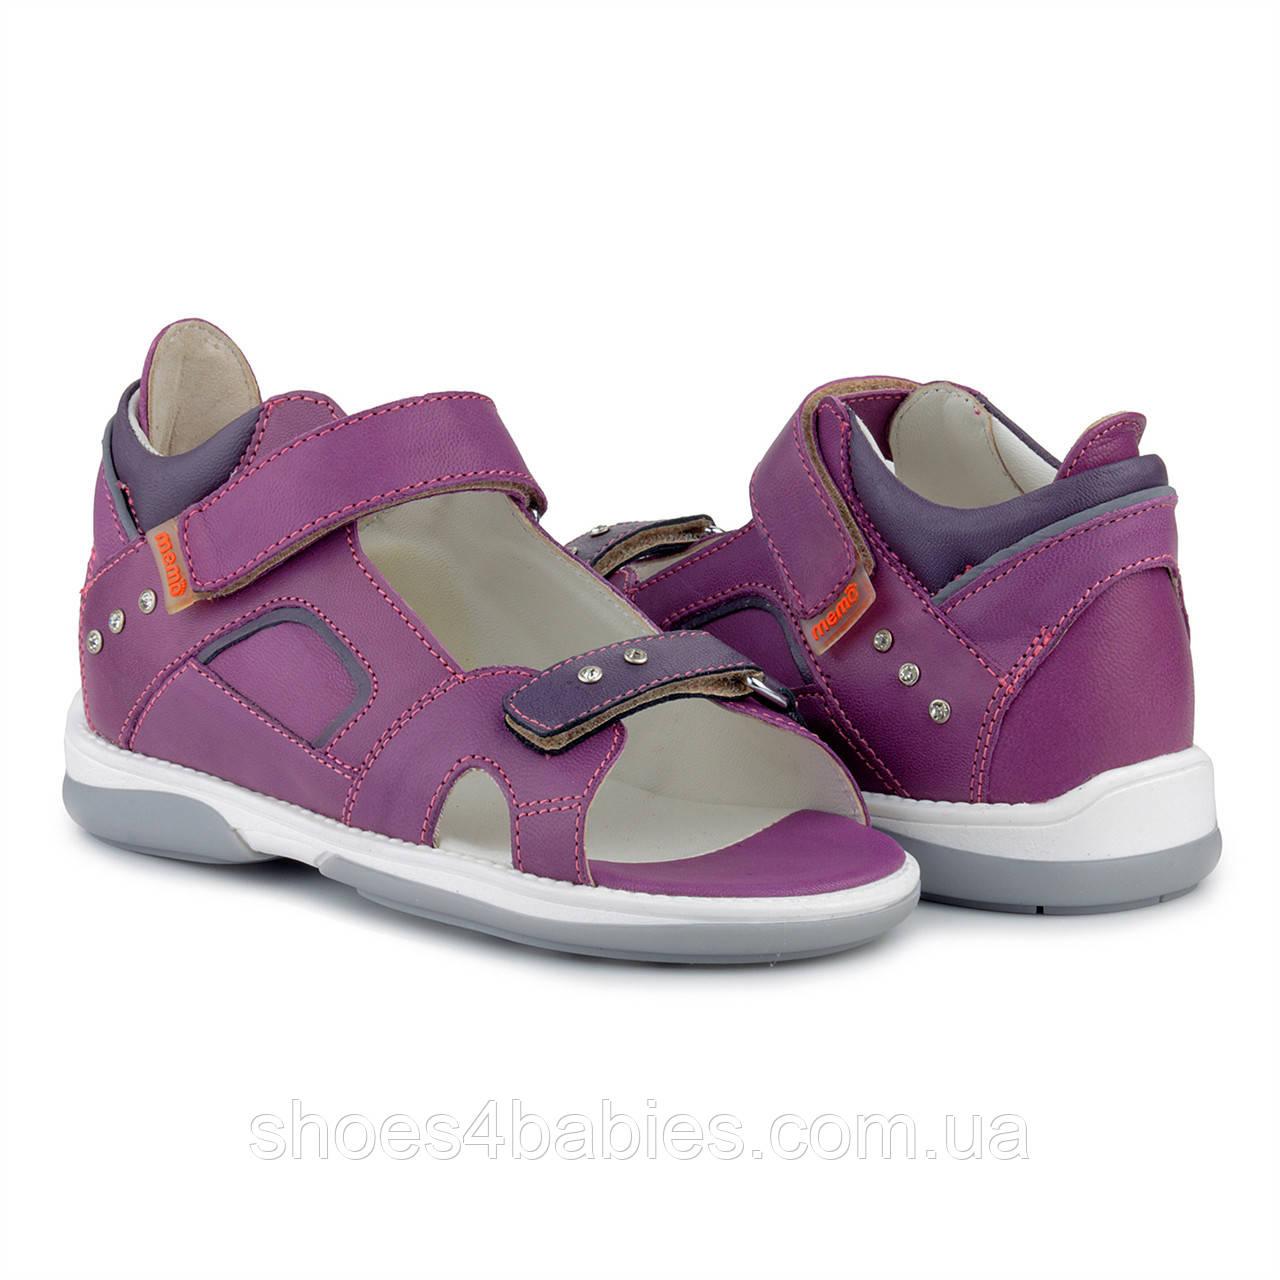 Memo Capri 3NA Фиолетовые Детские ортопедические босоножки (р.30-38)